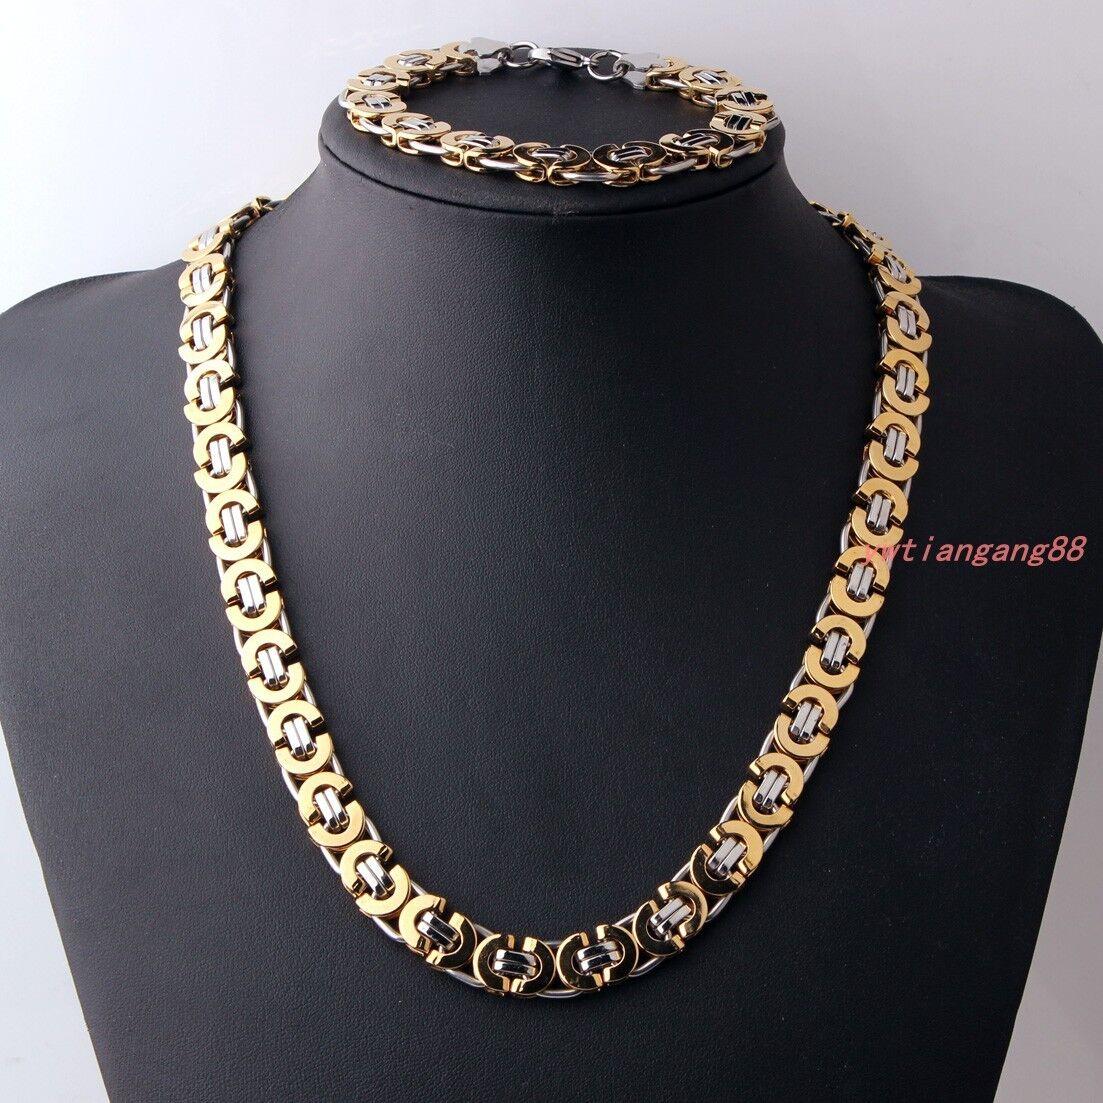 Silver Chain Link Bracelet: Stainless Steel Hot Link Chain Necklace & Bracelet Set Men